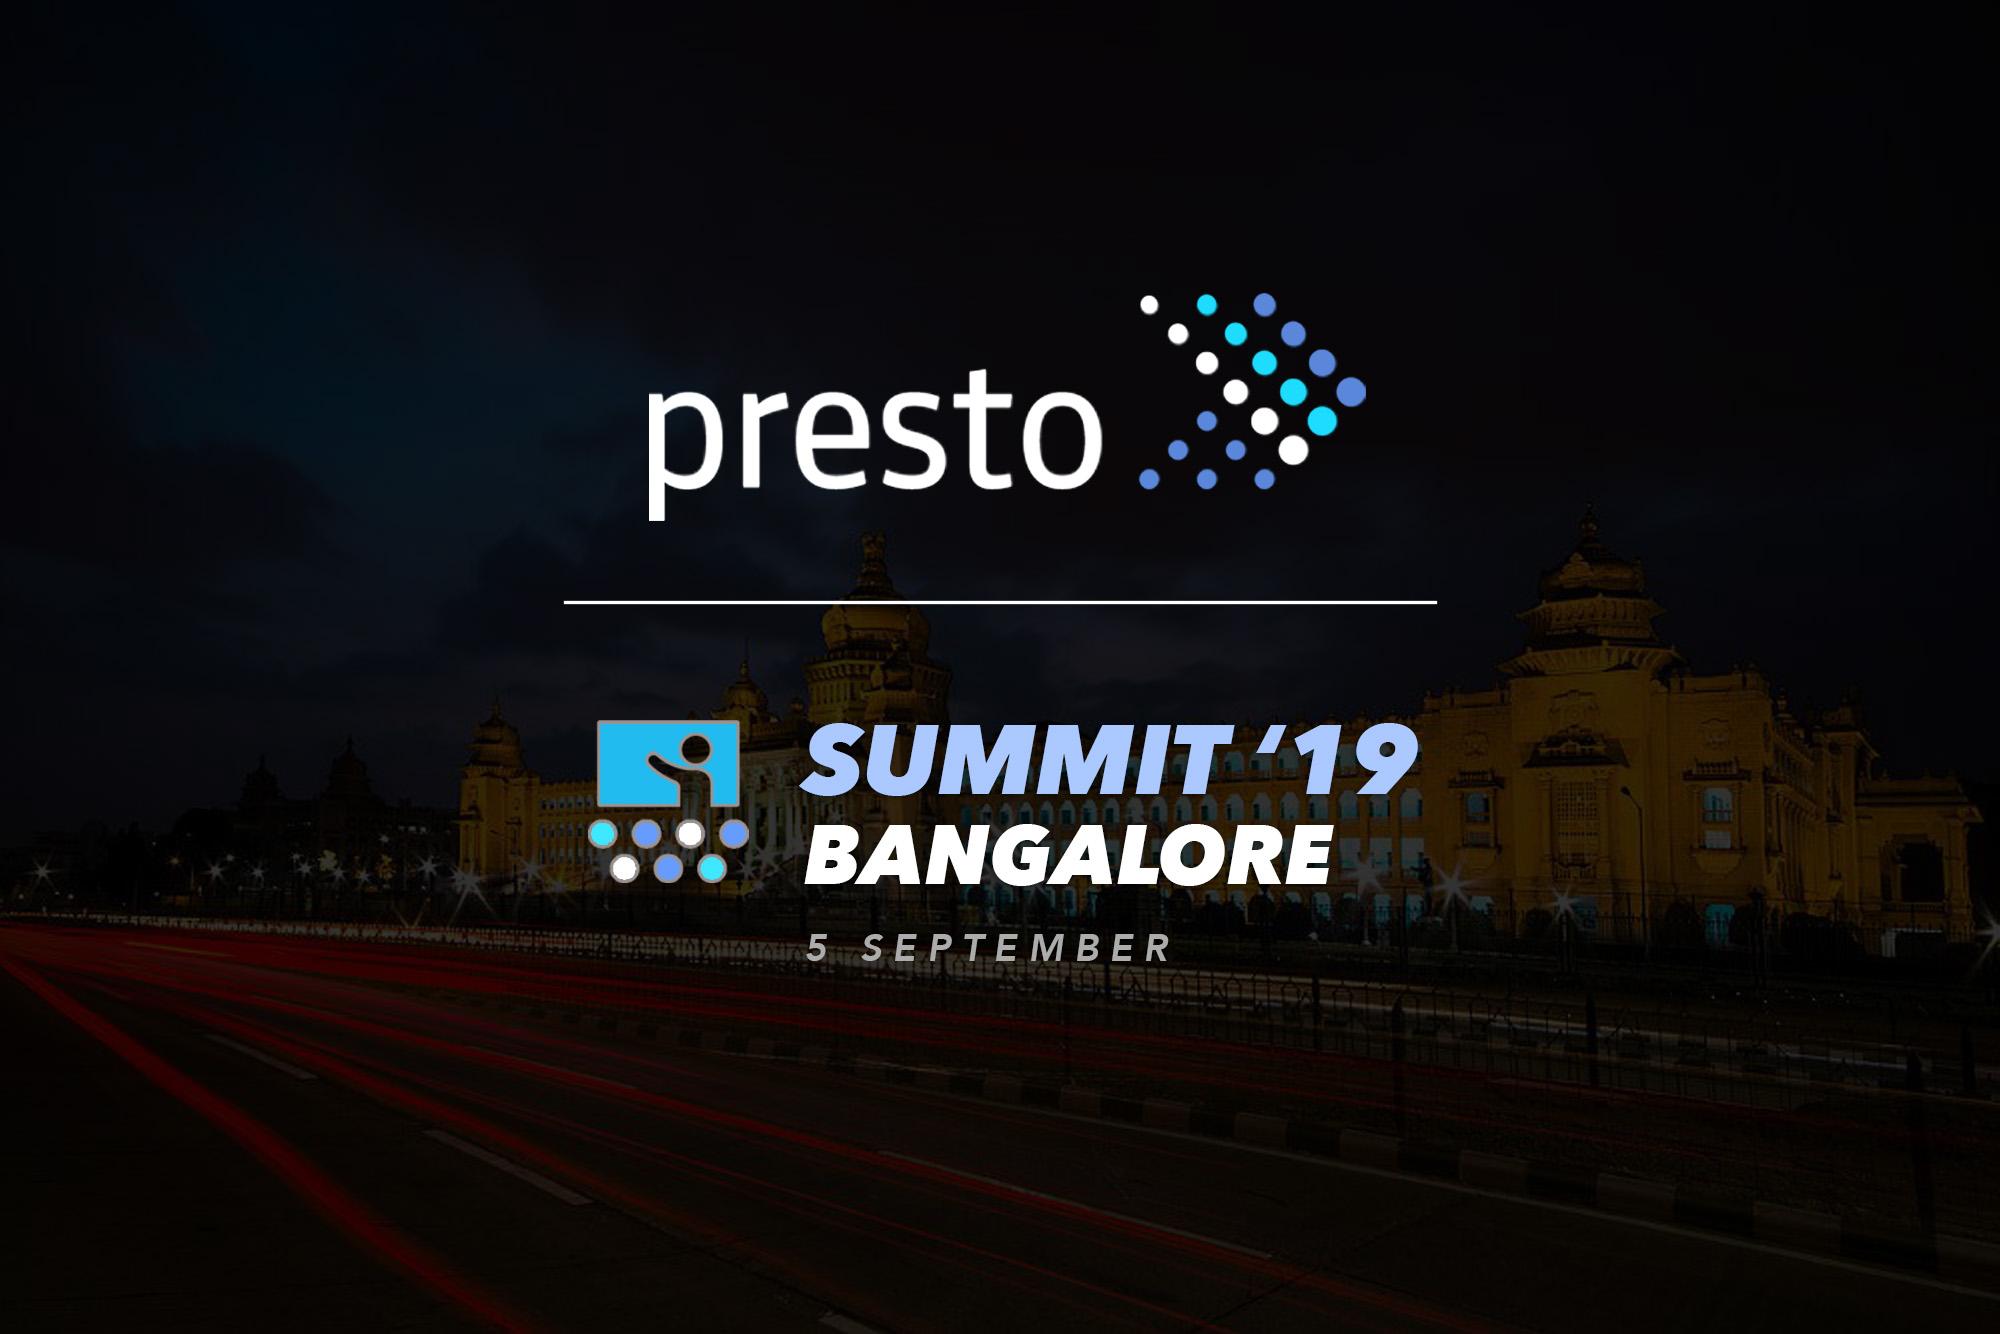 Presto Summit Bangalore